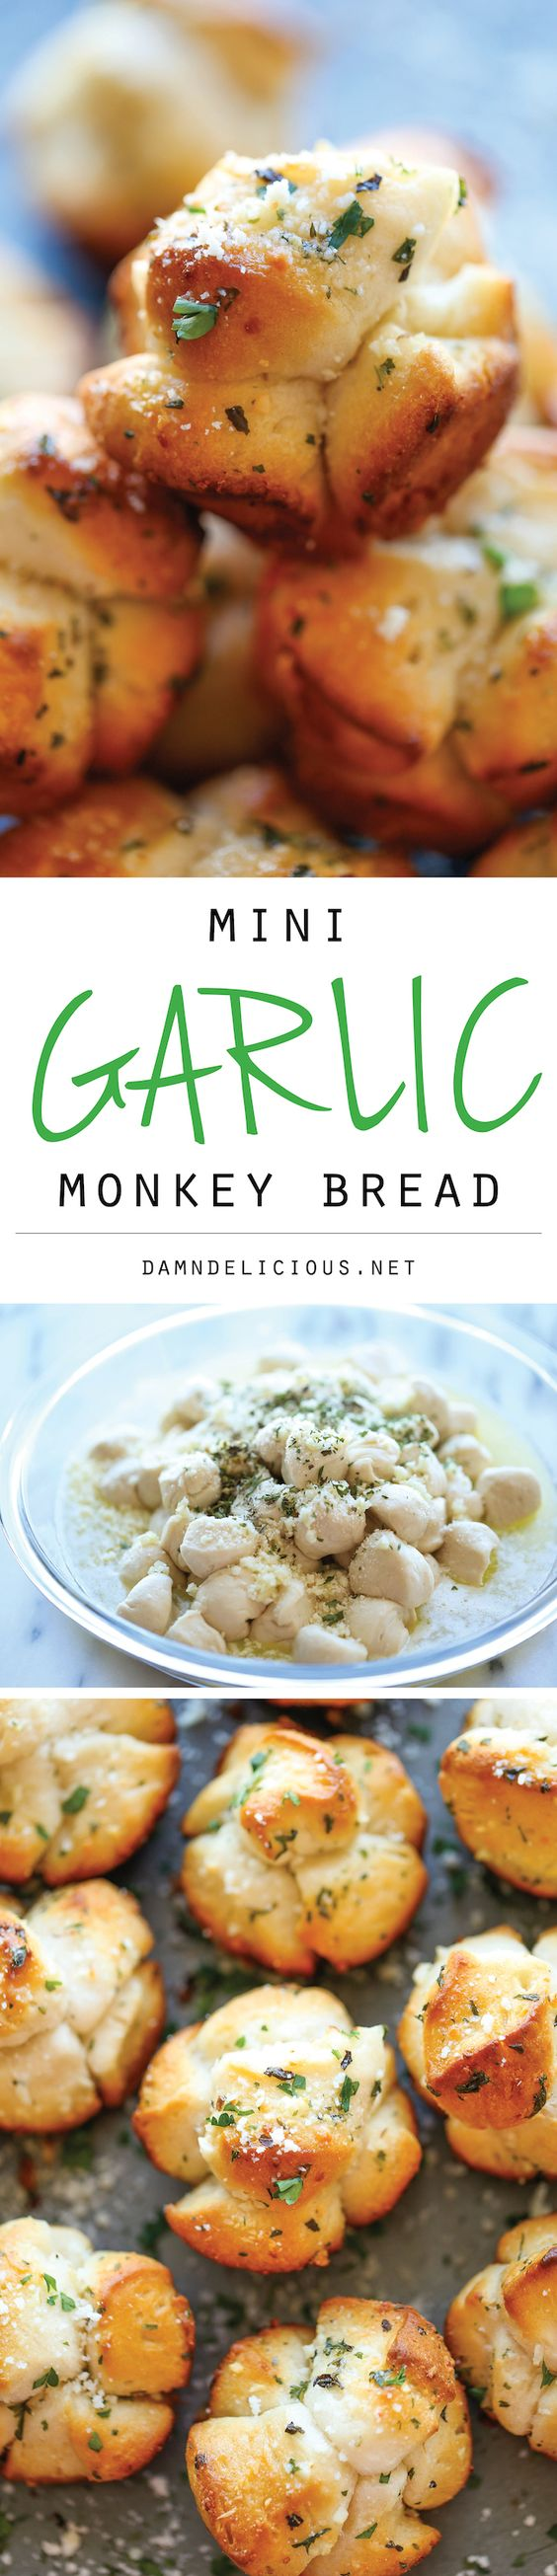 Mini Garlic Monkey Bread | Recipe | Garlic Monkey Bread, Monkey Bread ...